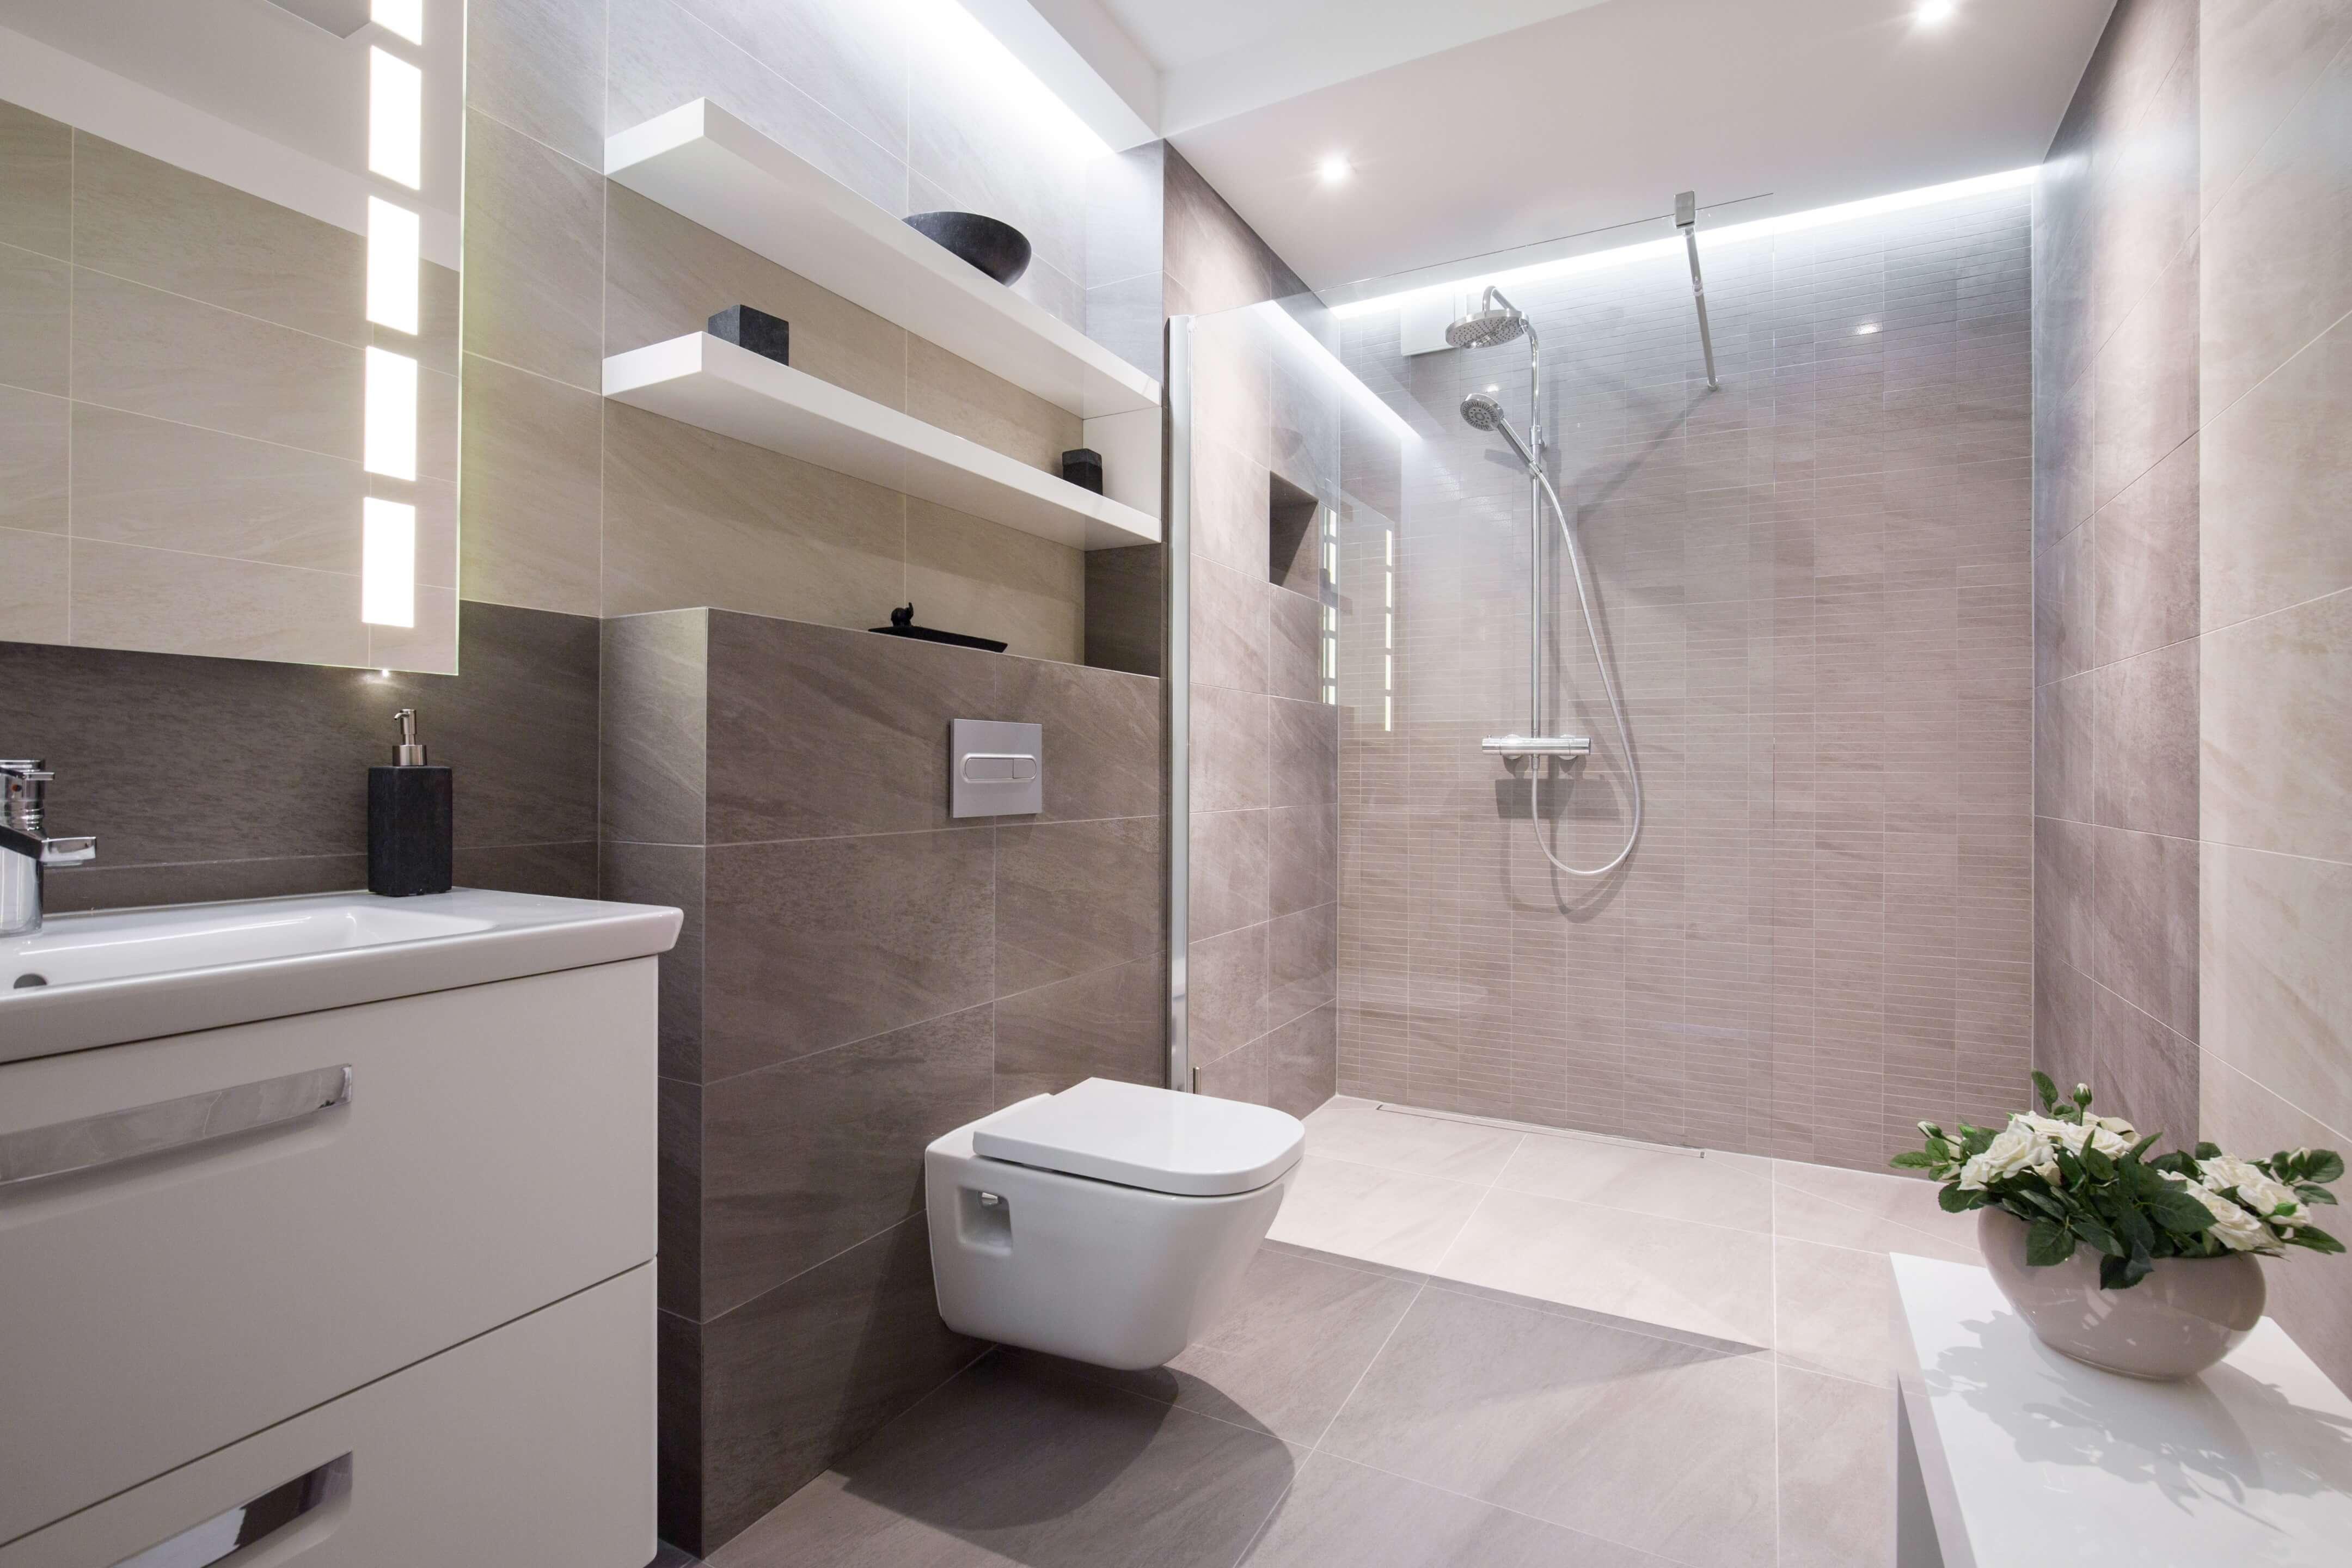 local bathroom fitters mayfair